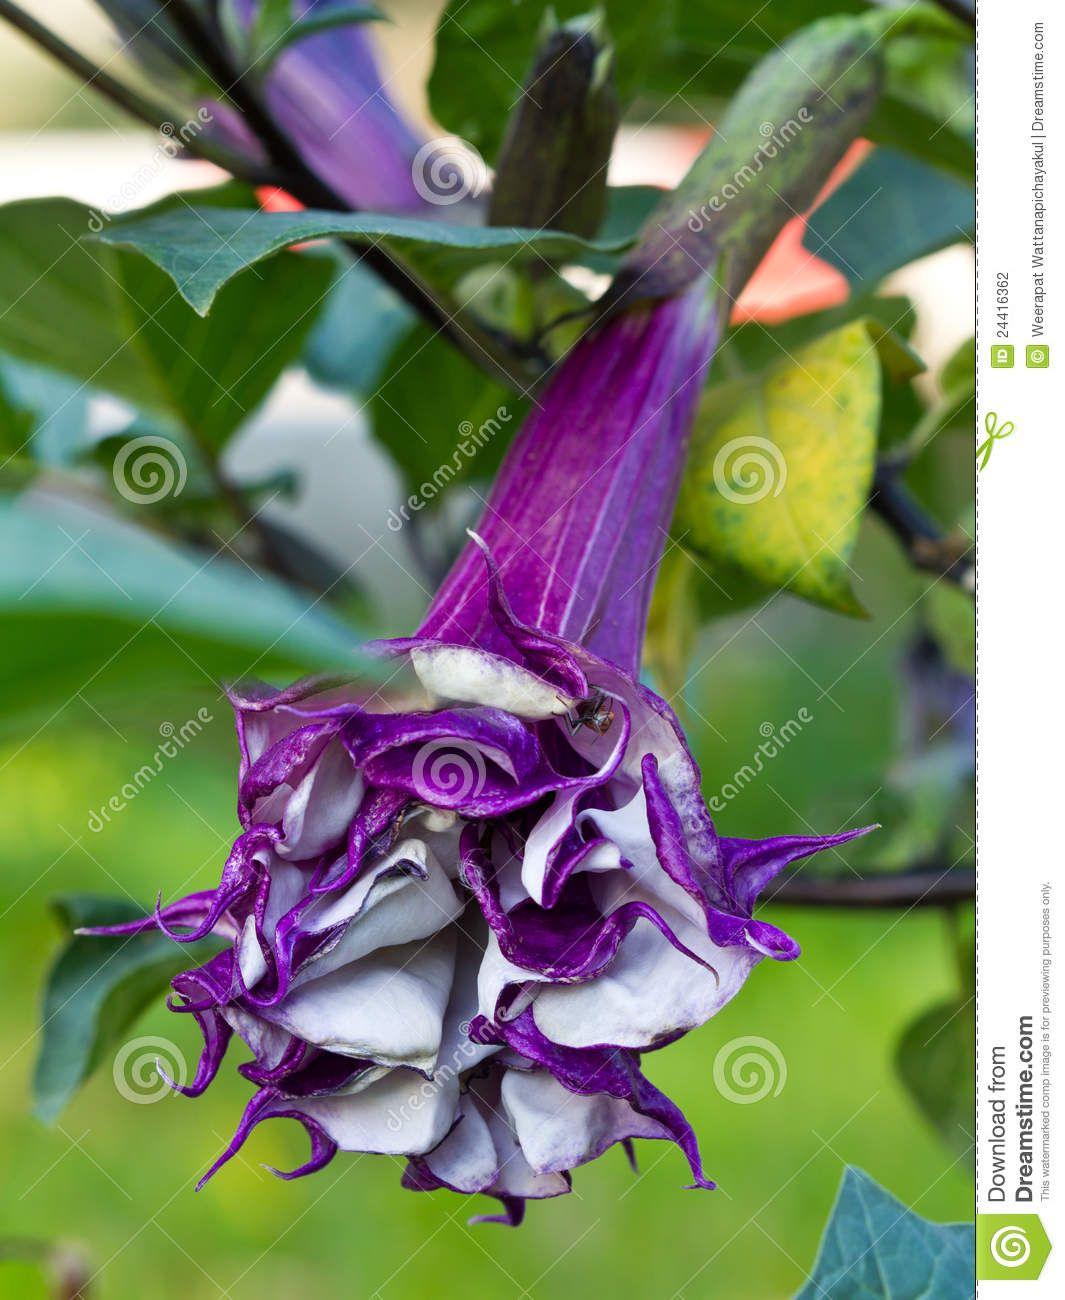 Beautiful but deadly datura flower stock photography image beautiful but deadly datura flower stock photography image 24416362 izmirmasajfo